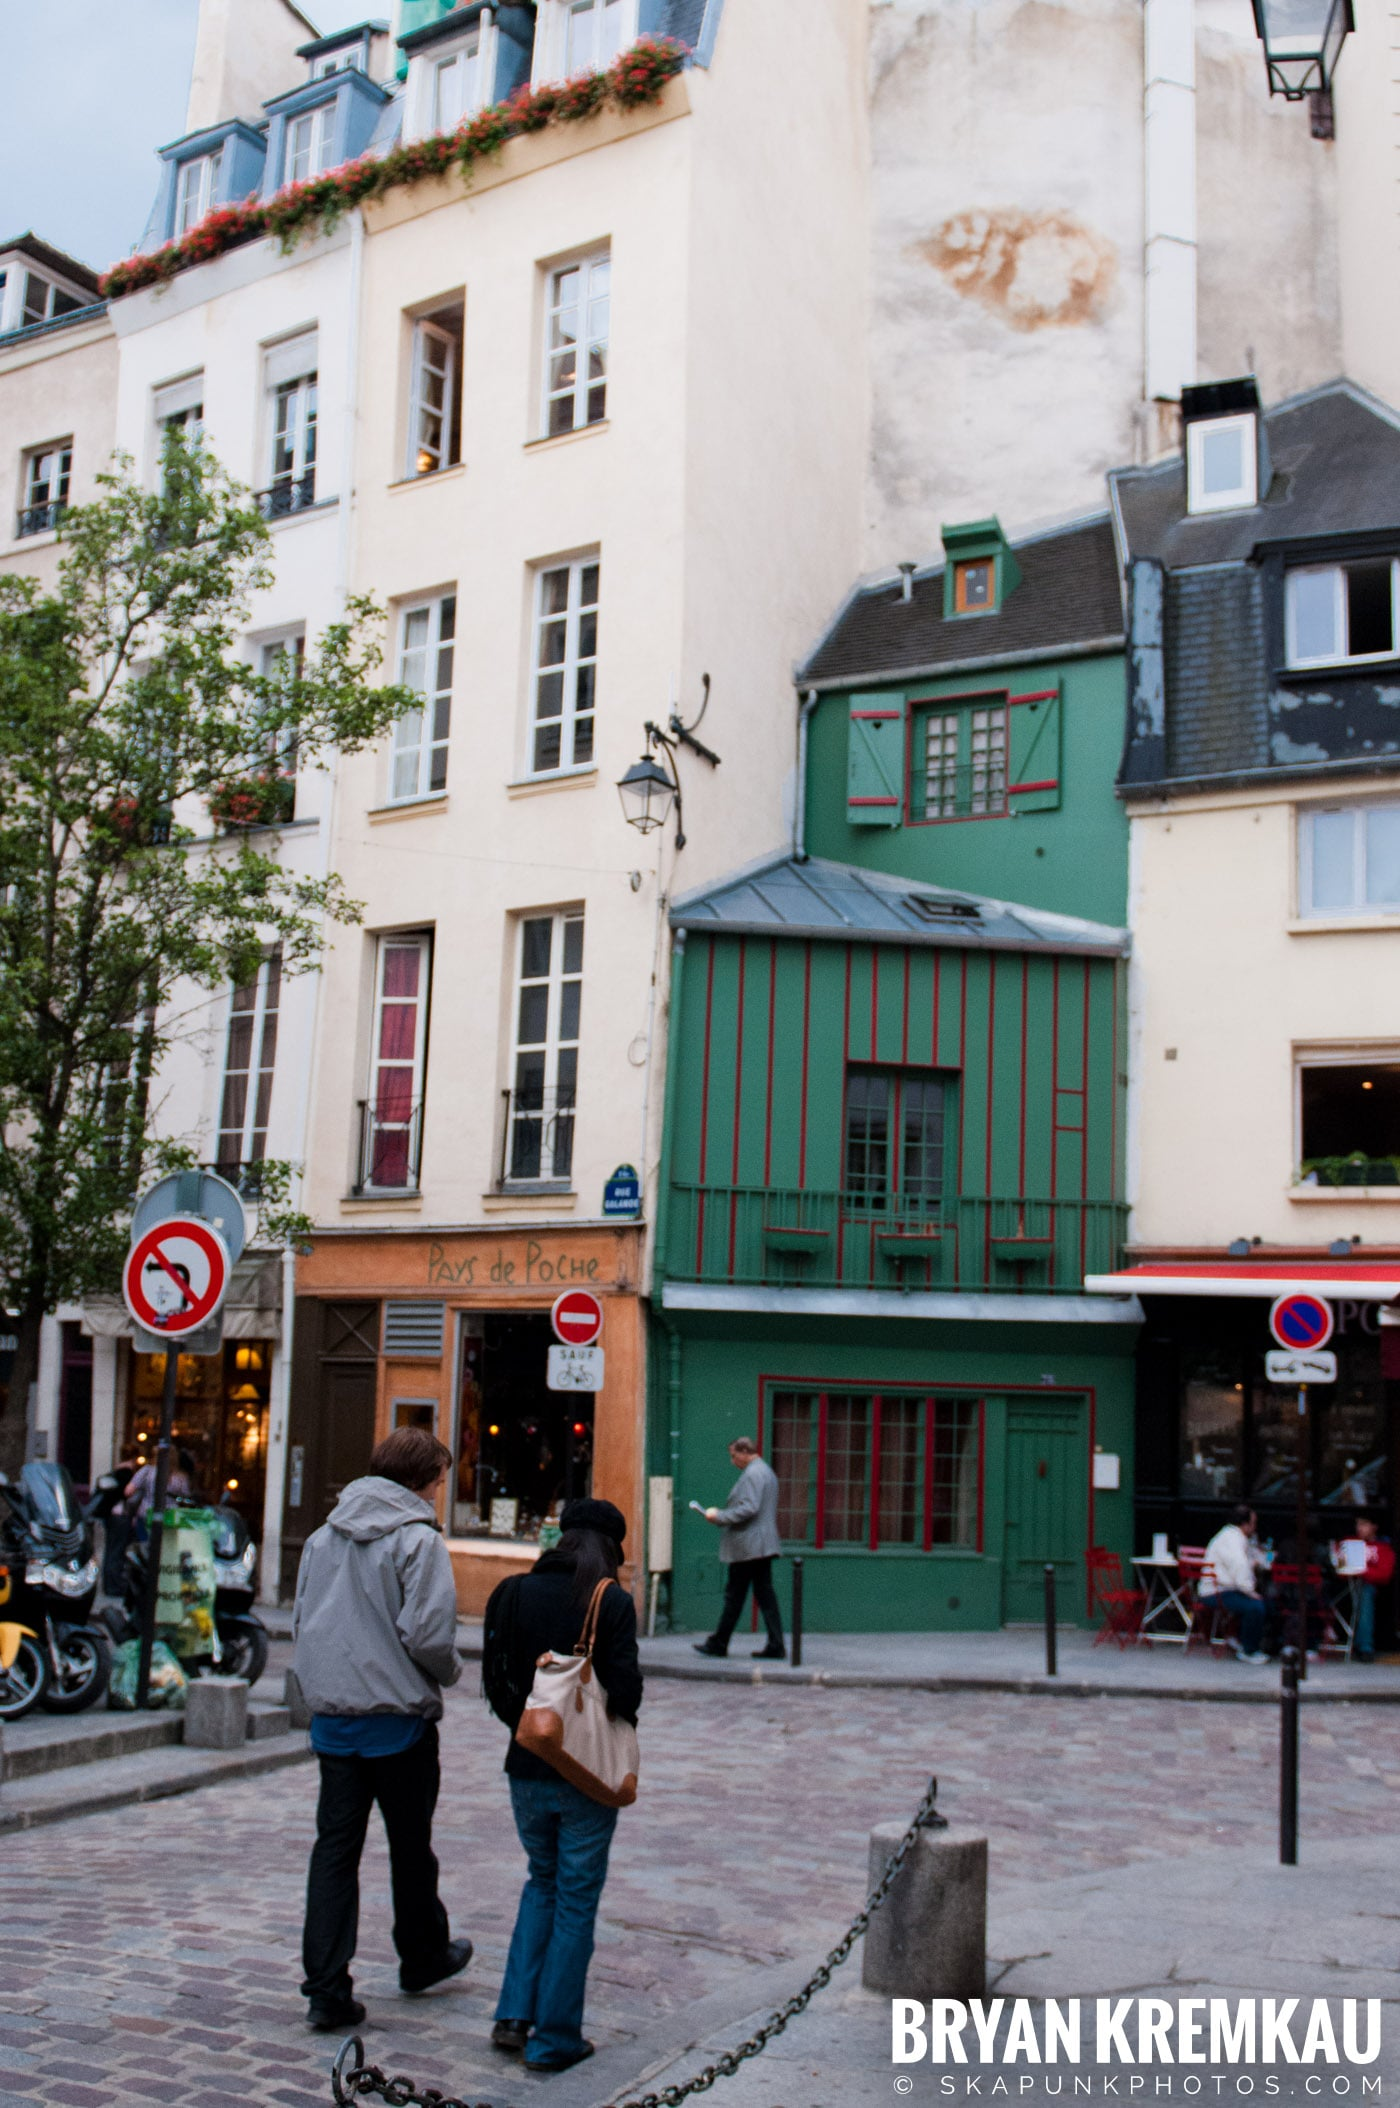 Paris, France Honeymoon - Day 4 - 7.21.11 (109)